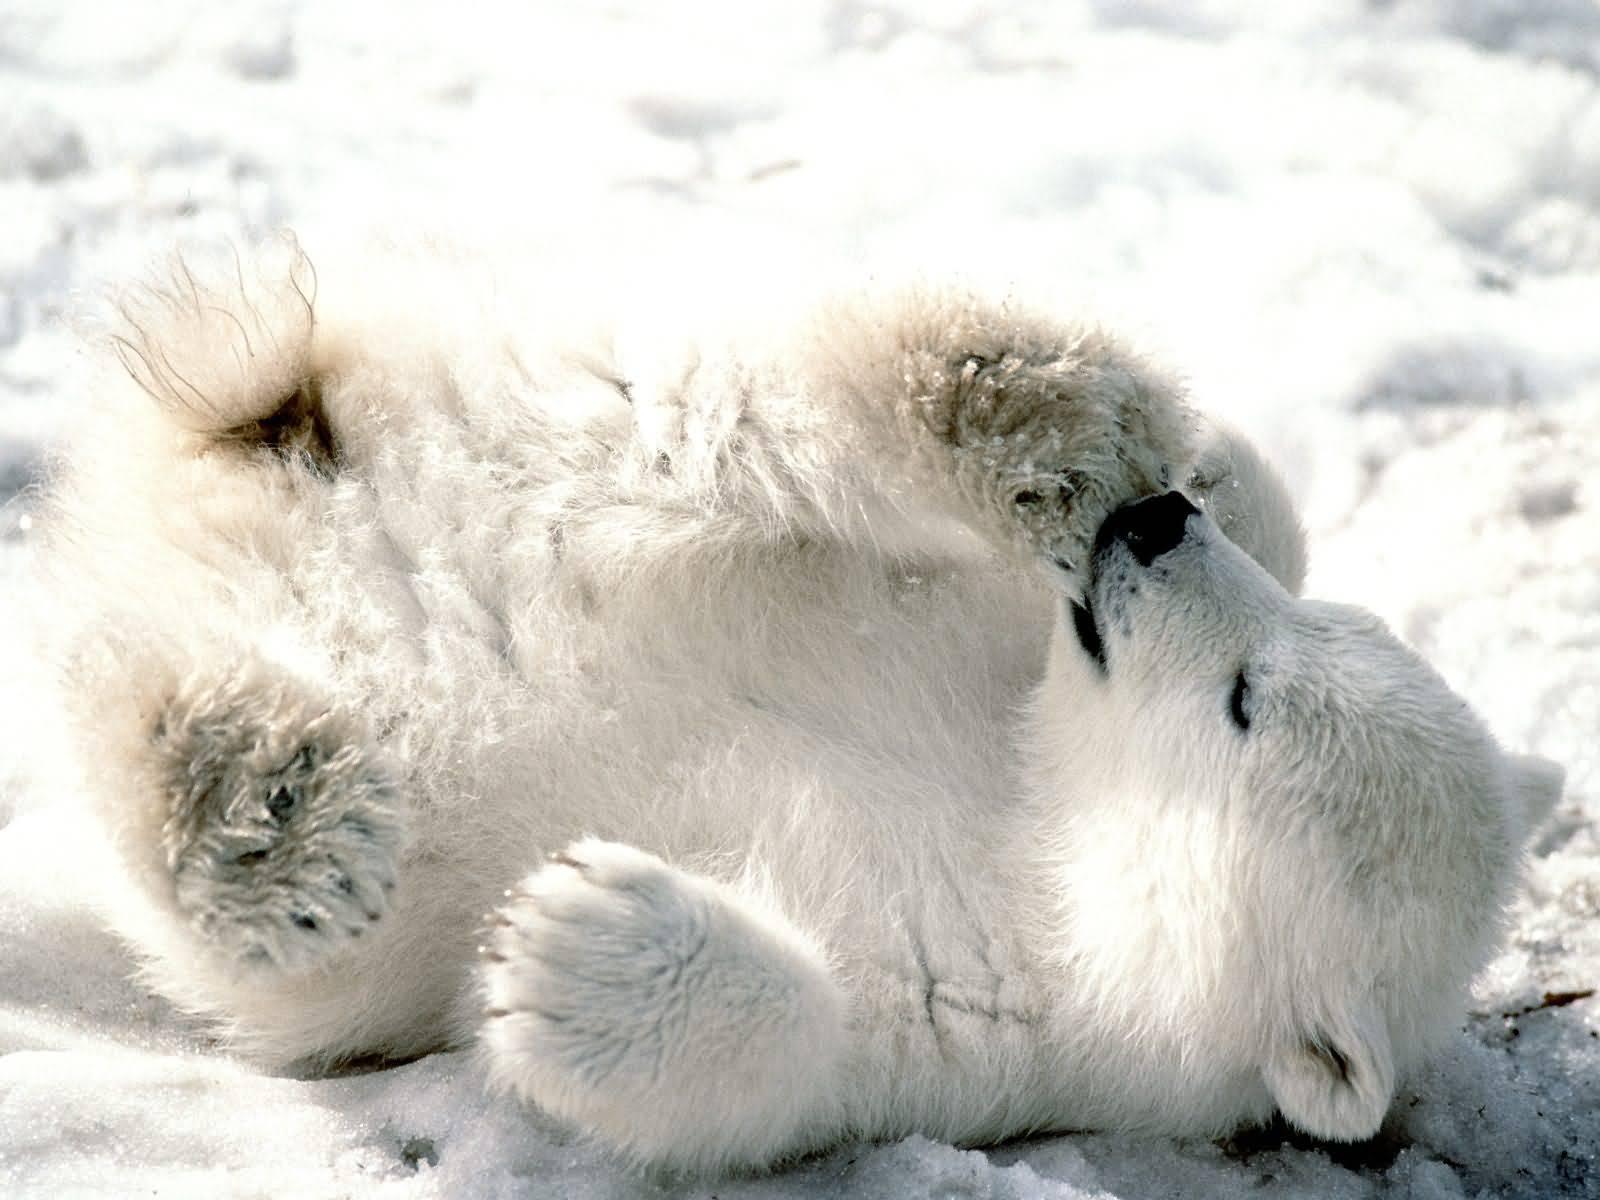 d4de9c3a8cc3b Image 2. playful polar bear cub courtesy of firstpeople.us